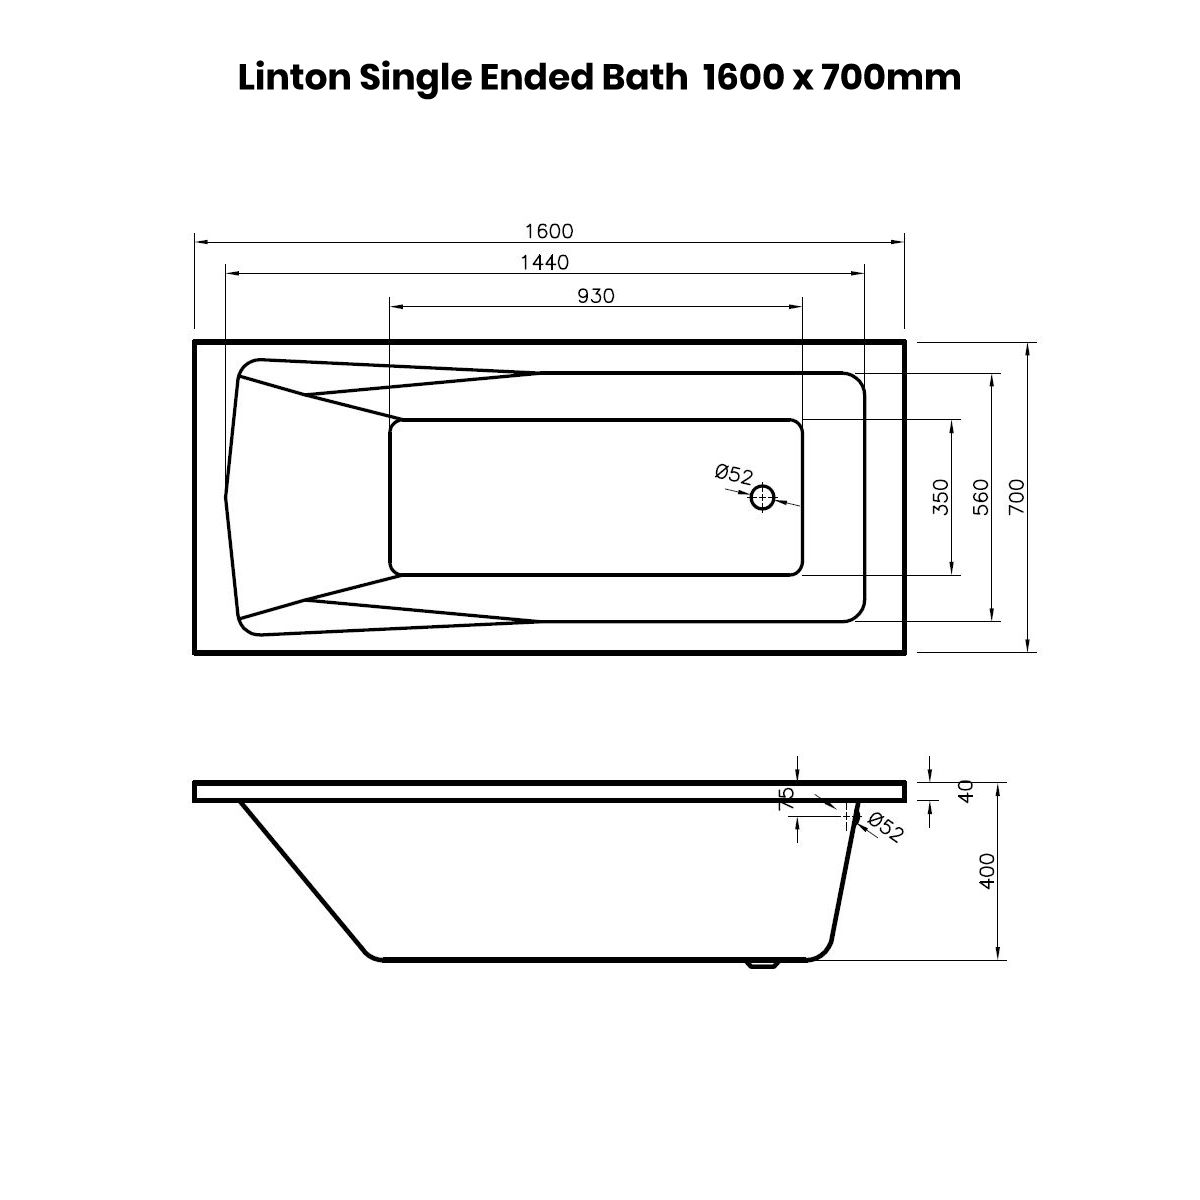 Nuie Linton Straight Shower Bath 1600 x 700mm Dimensions